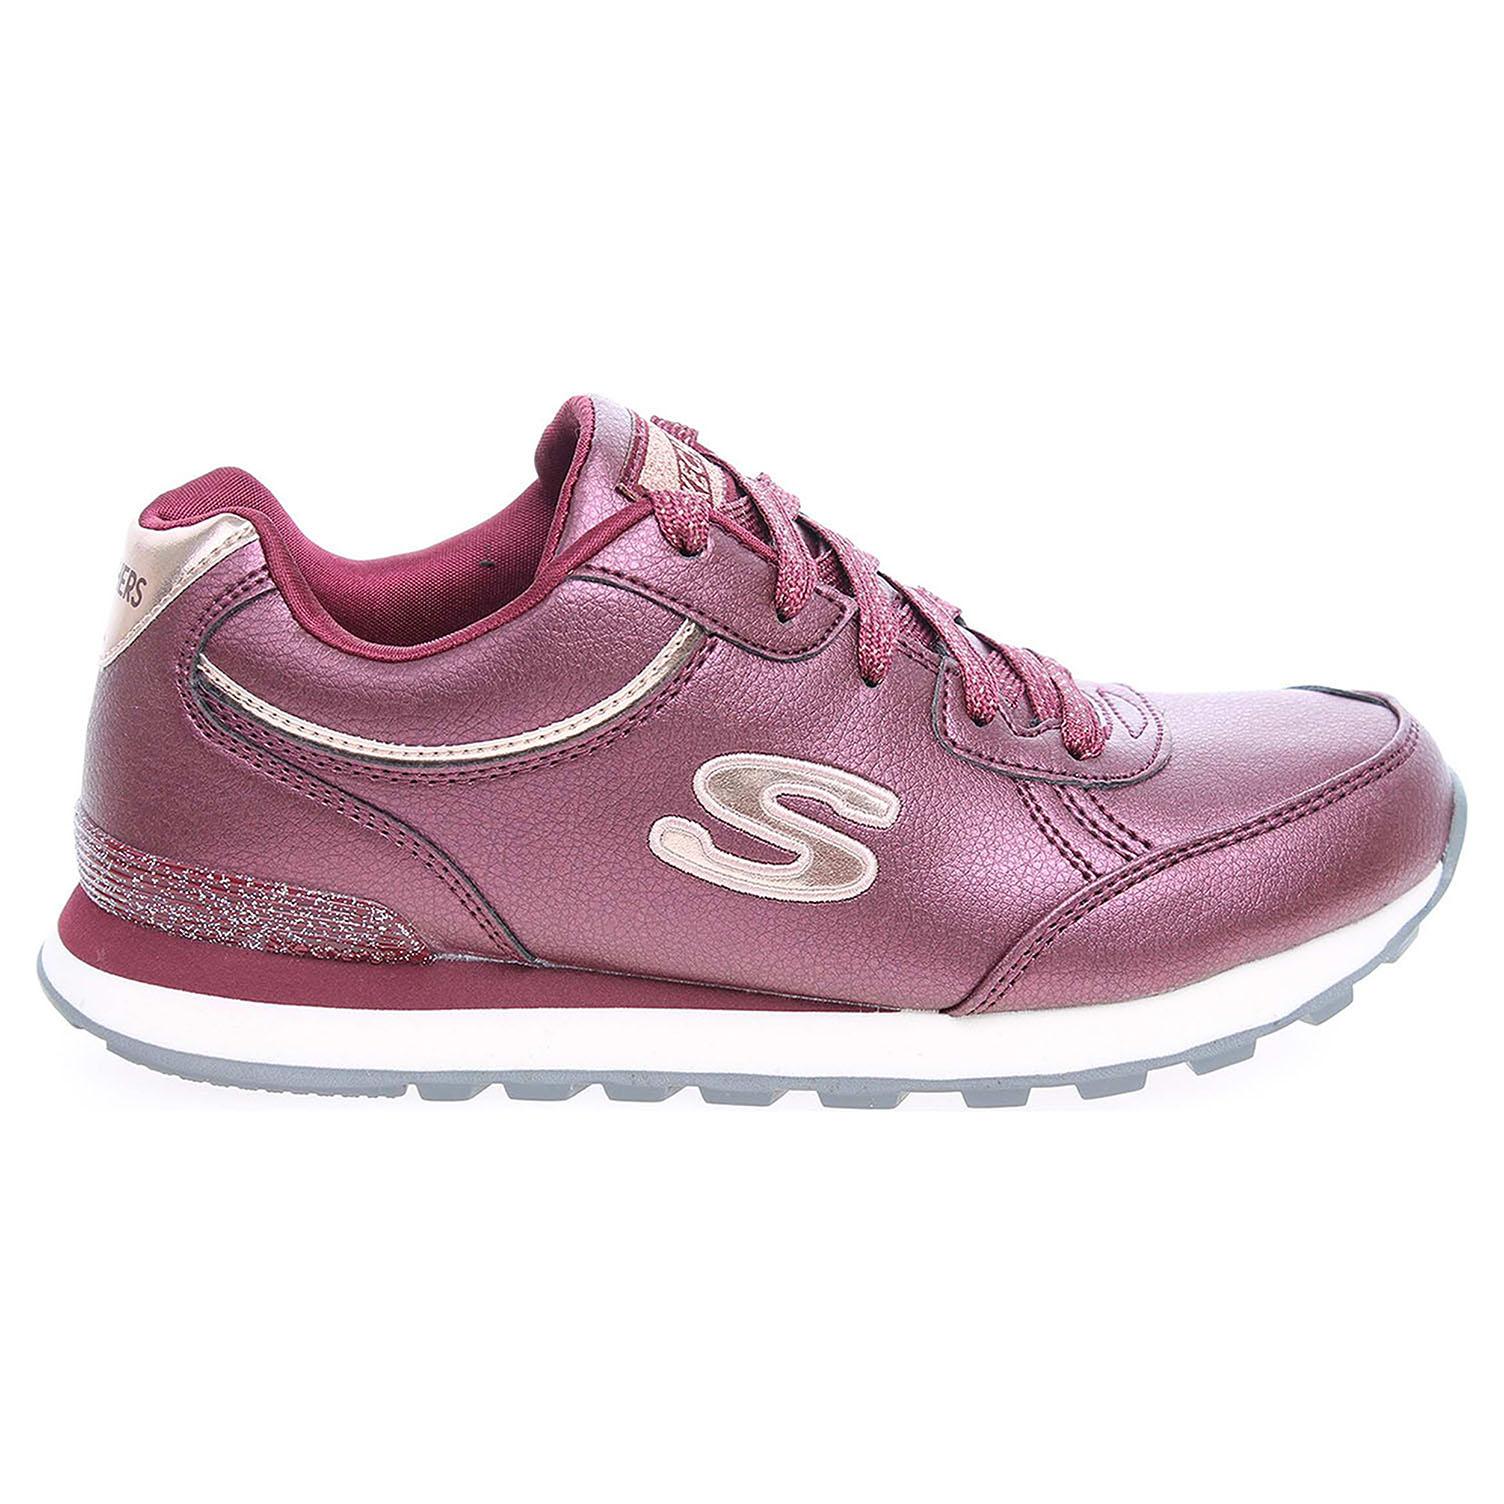 Skechers Shimmers burgundy 37